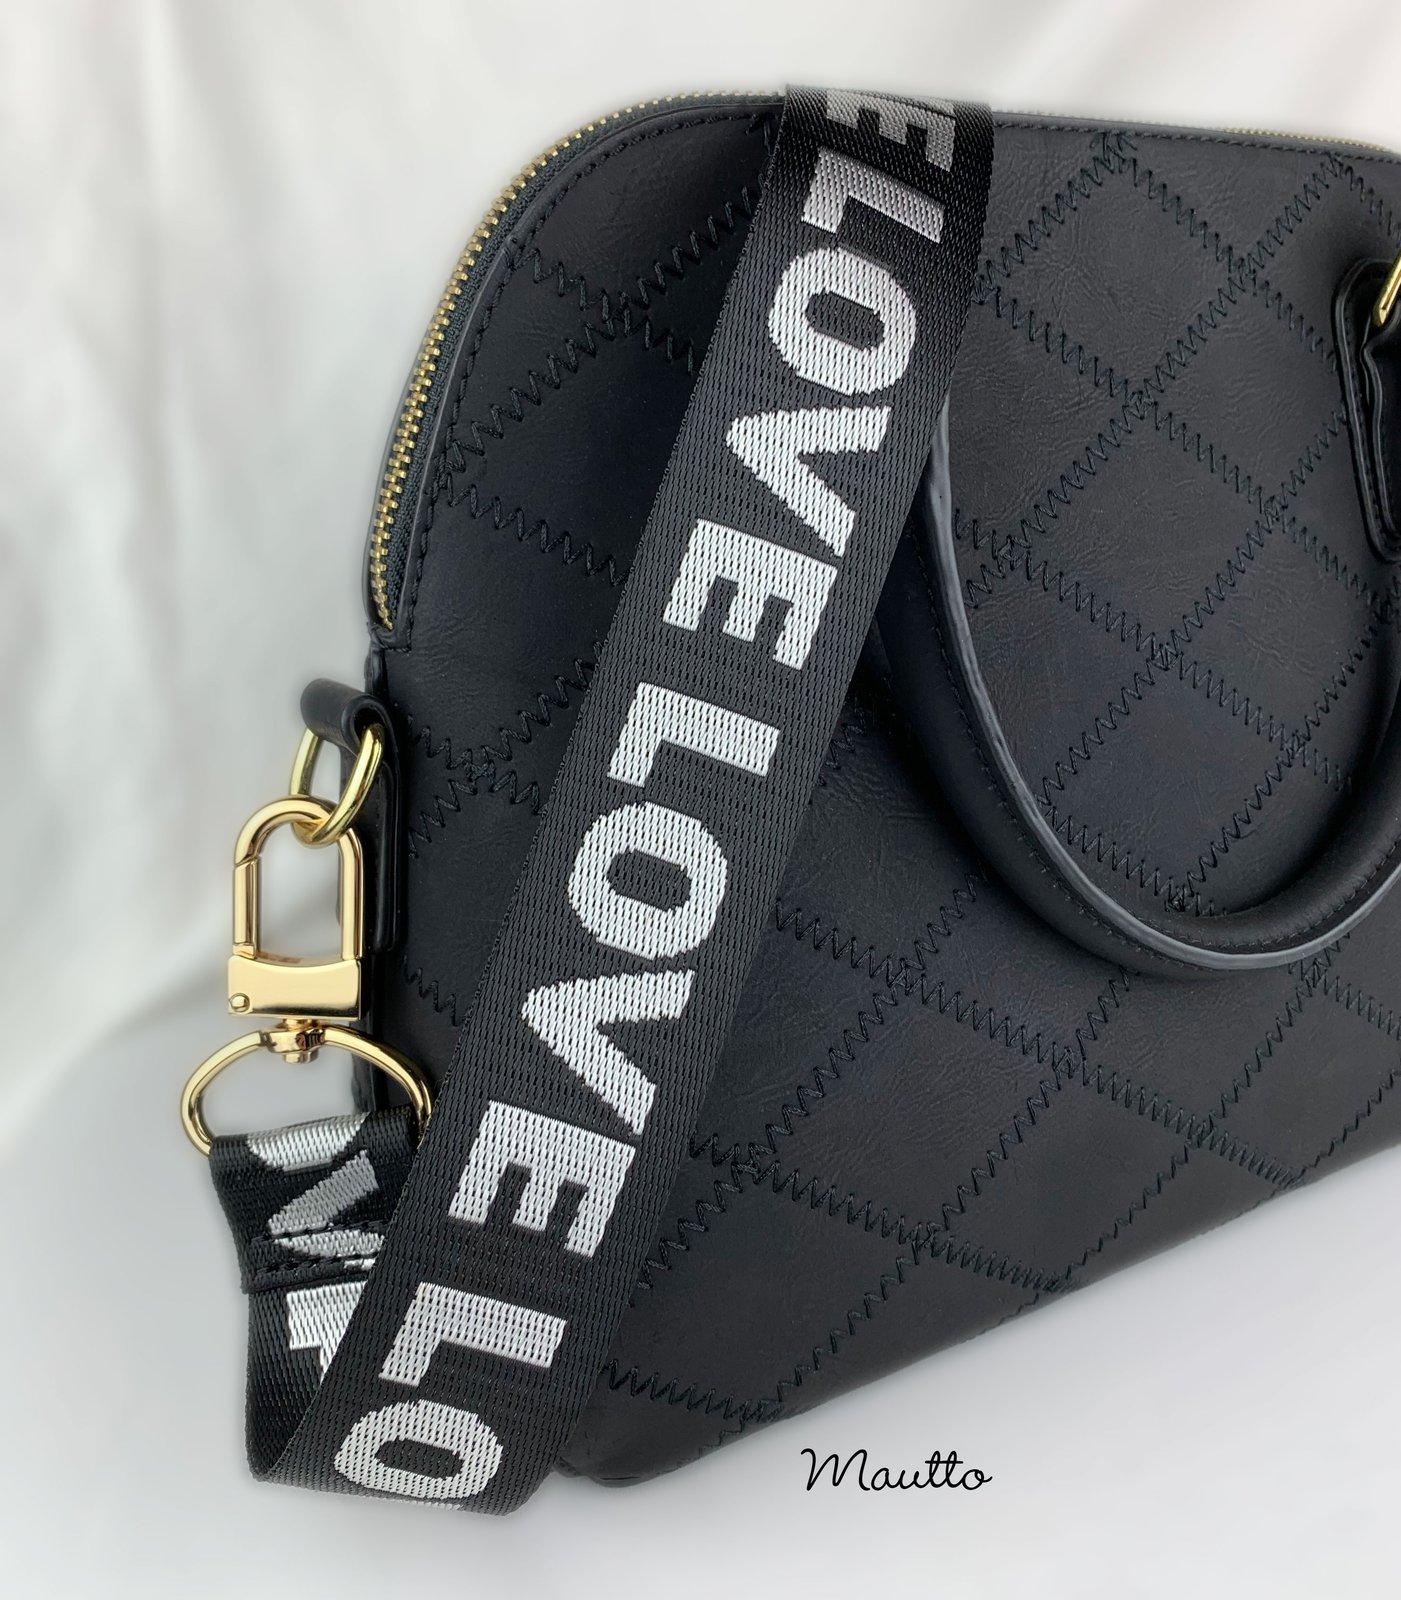 Adjustable Purse Handle Shoulder Bags Handbags Strap Replacement for DIY Bag Black